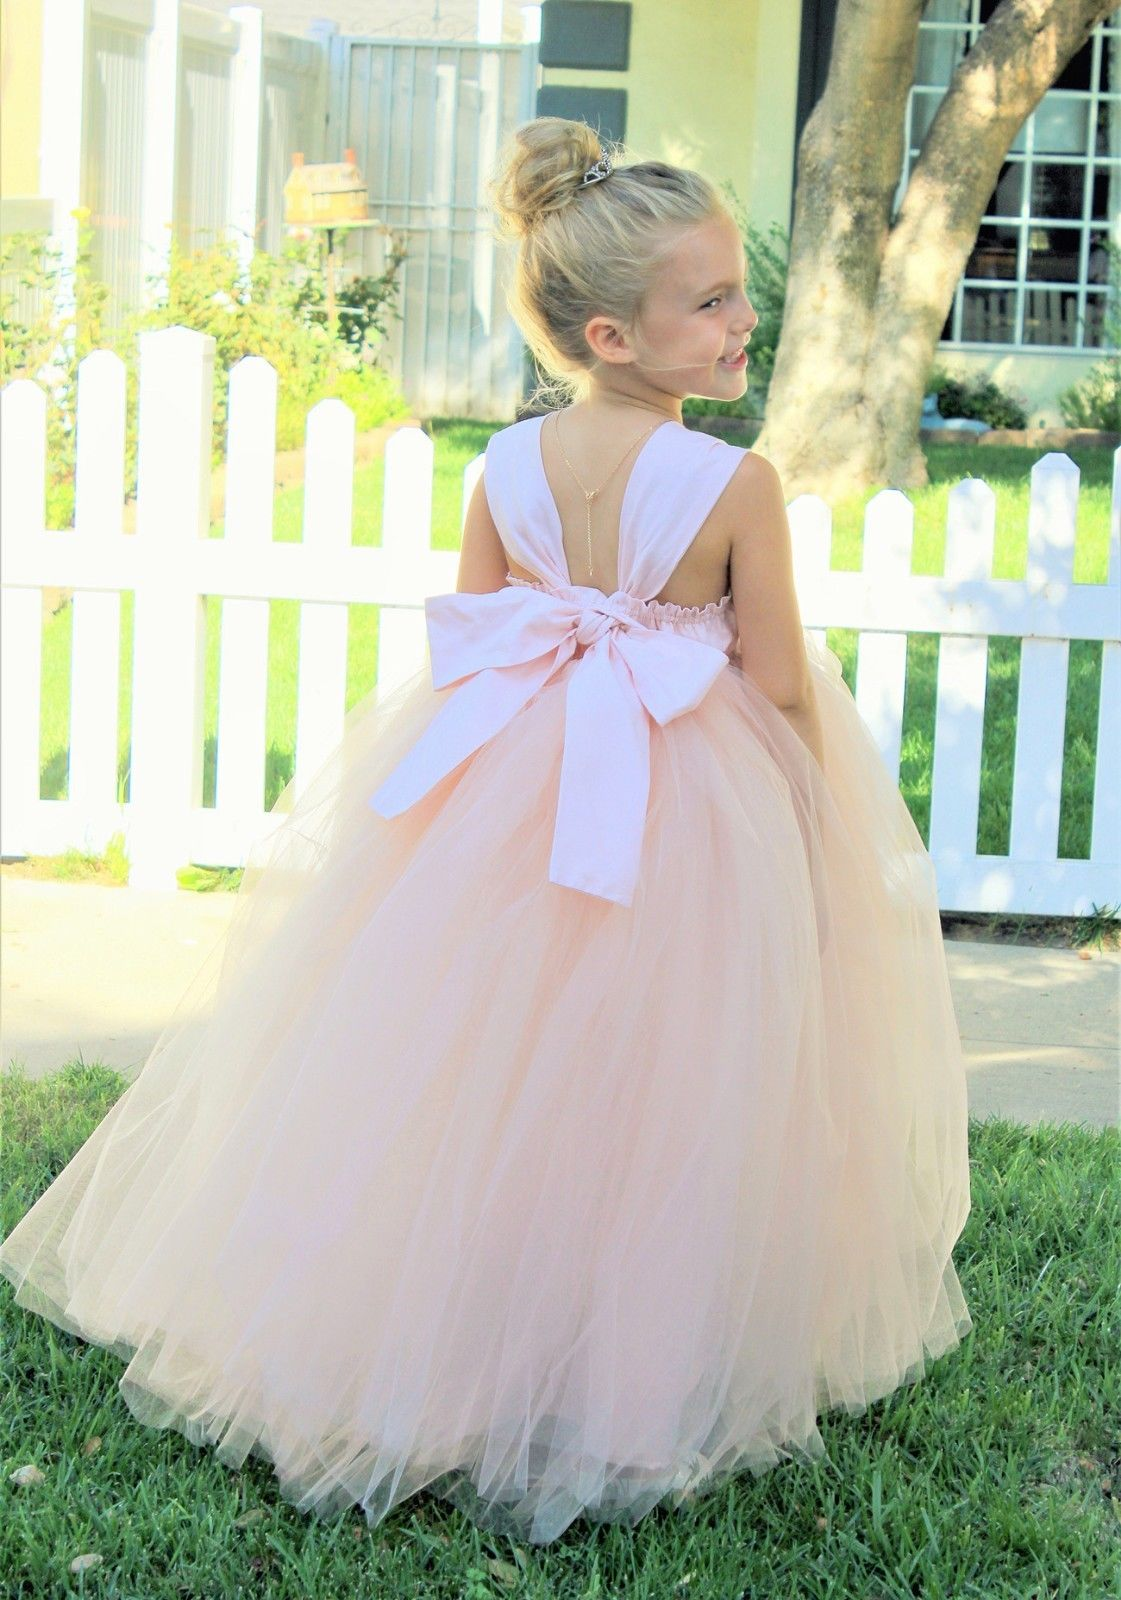 Ekidsbridal Sweetheart Neck Cotton Blush Pink Tutu Flower Girl Dresses Ball Gown Princess Dresses Formal Dress 171